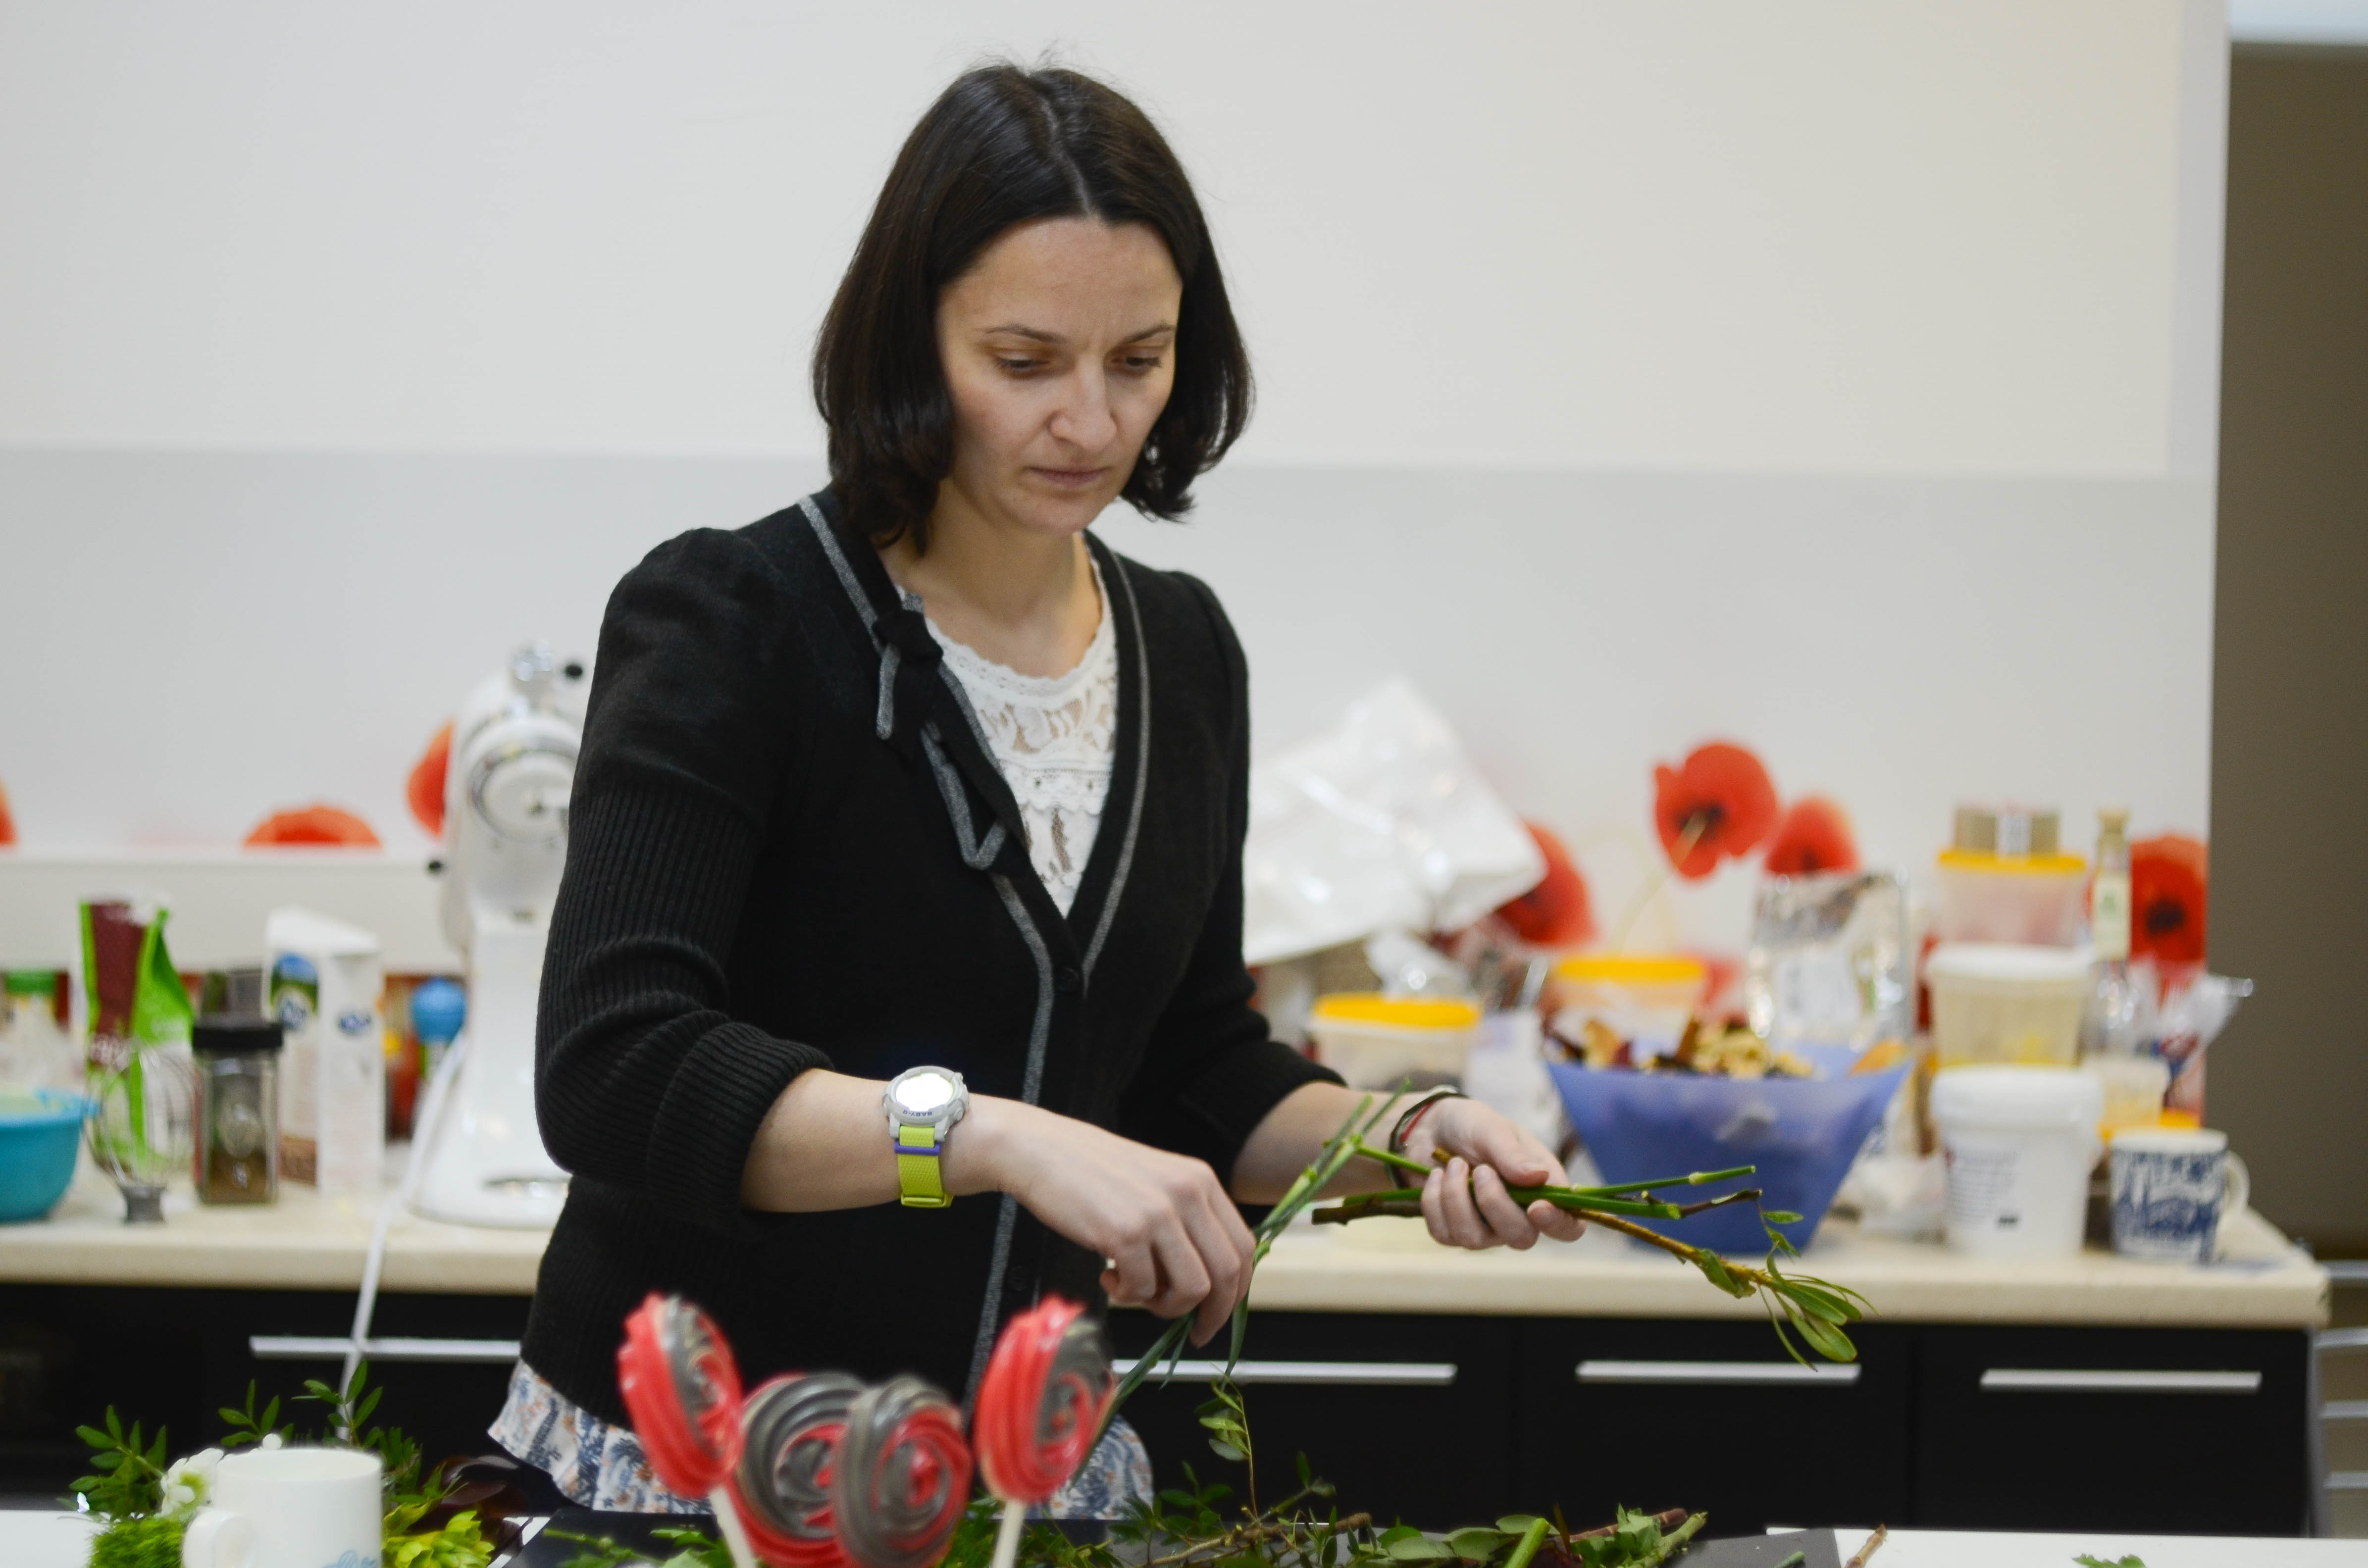 http://odry-school.ru/images/upload/DSC_0062.jpg